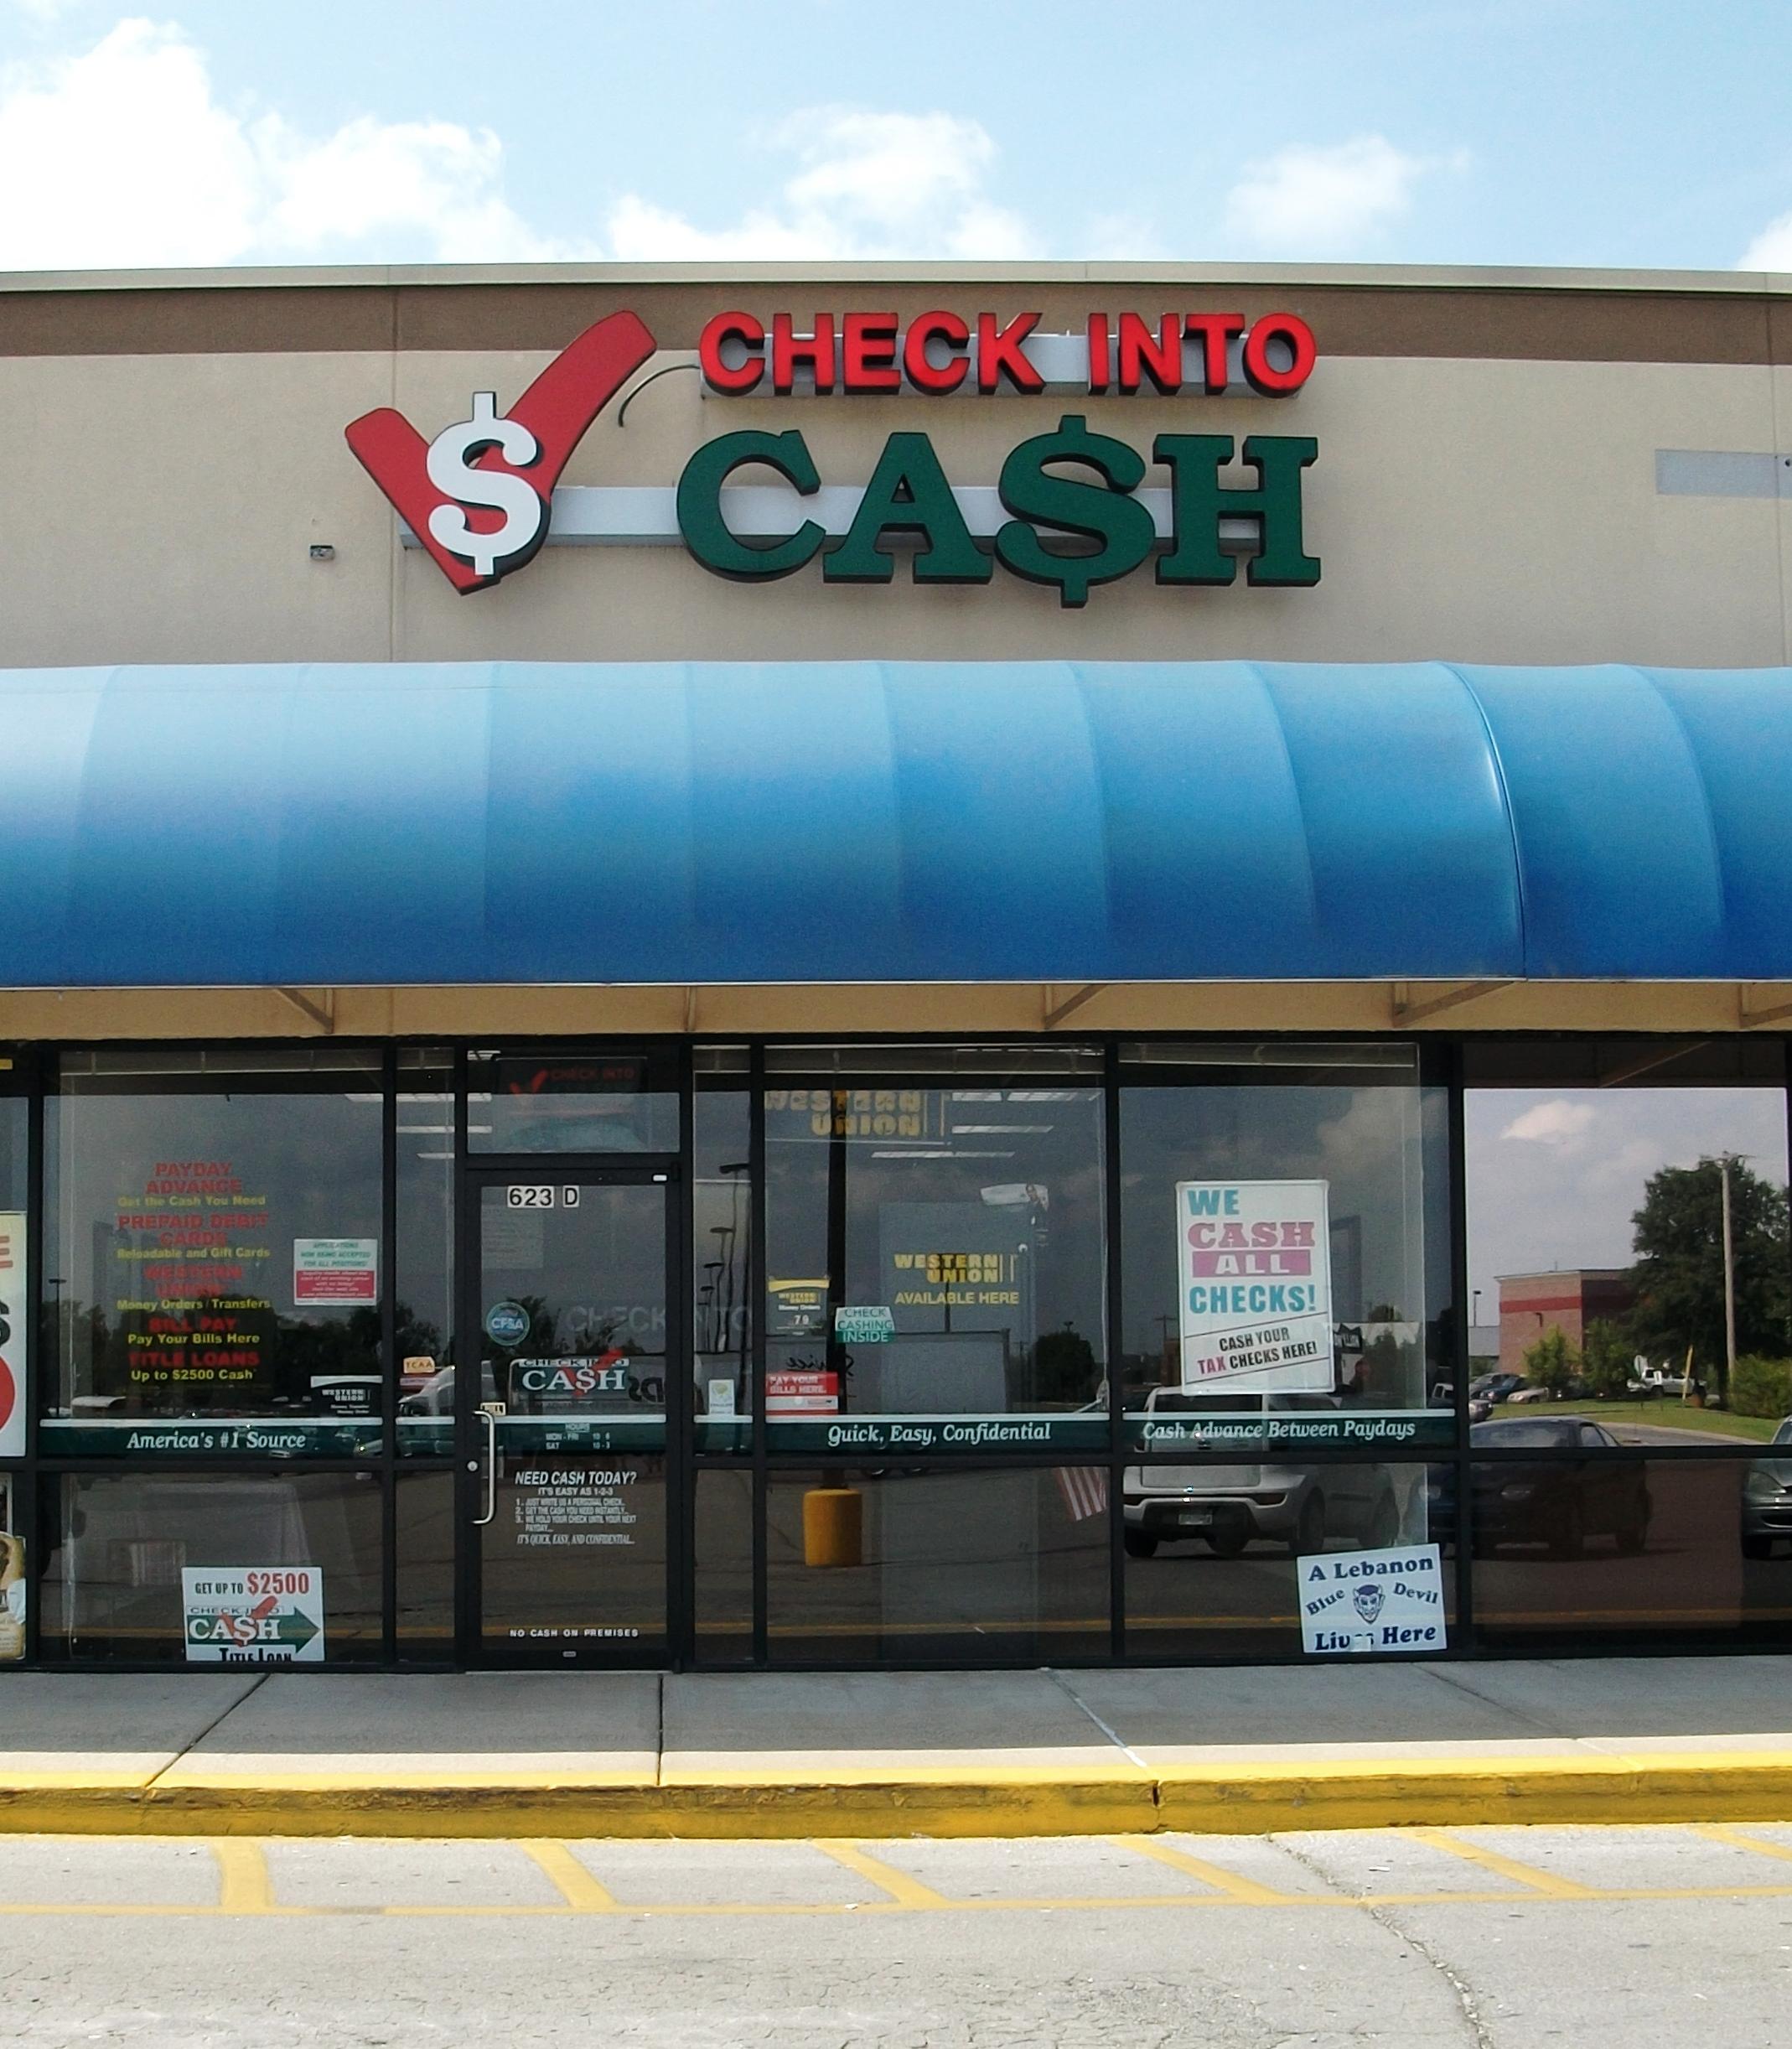 Payday loans bad idea image 5